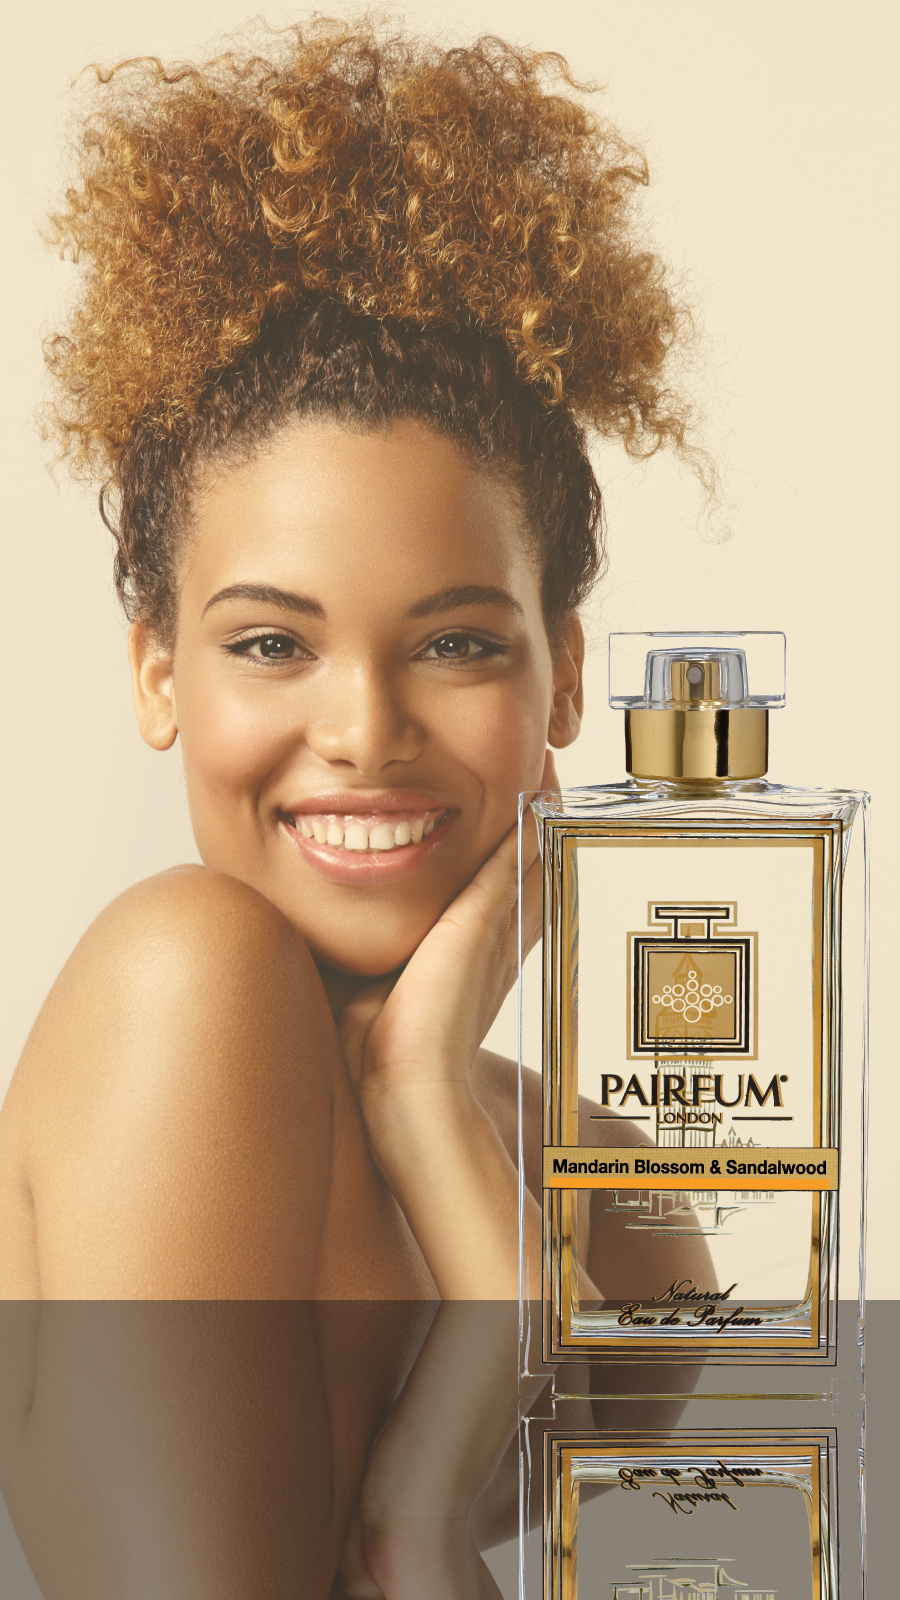 Eau De Parfum Person Reflection Mandarin Blossom Sandalwood Woman 9 16